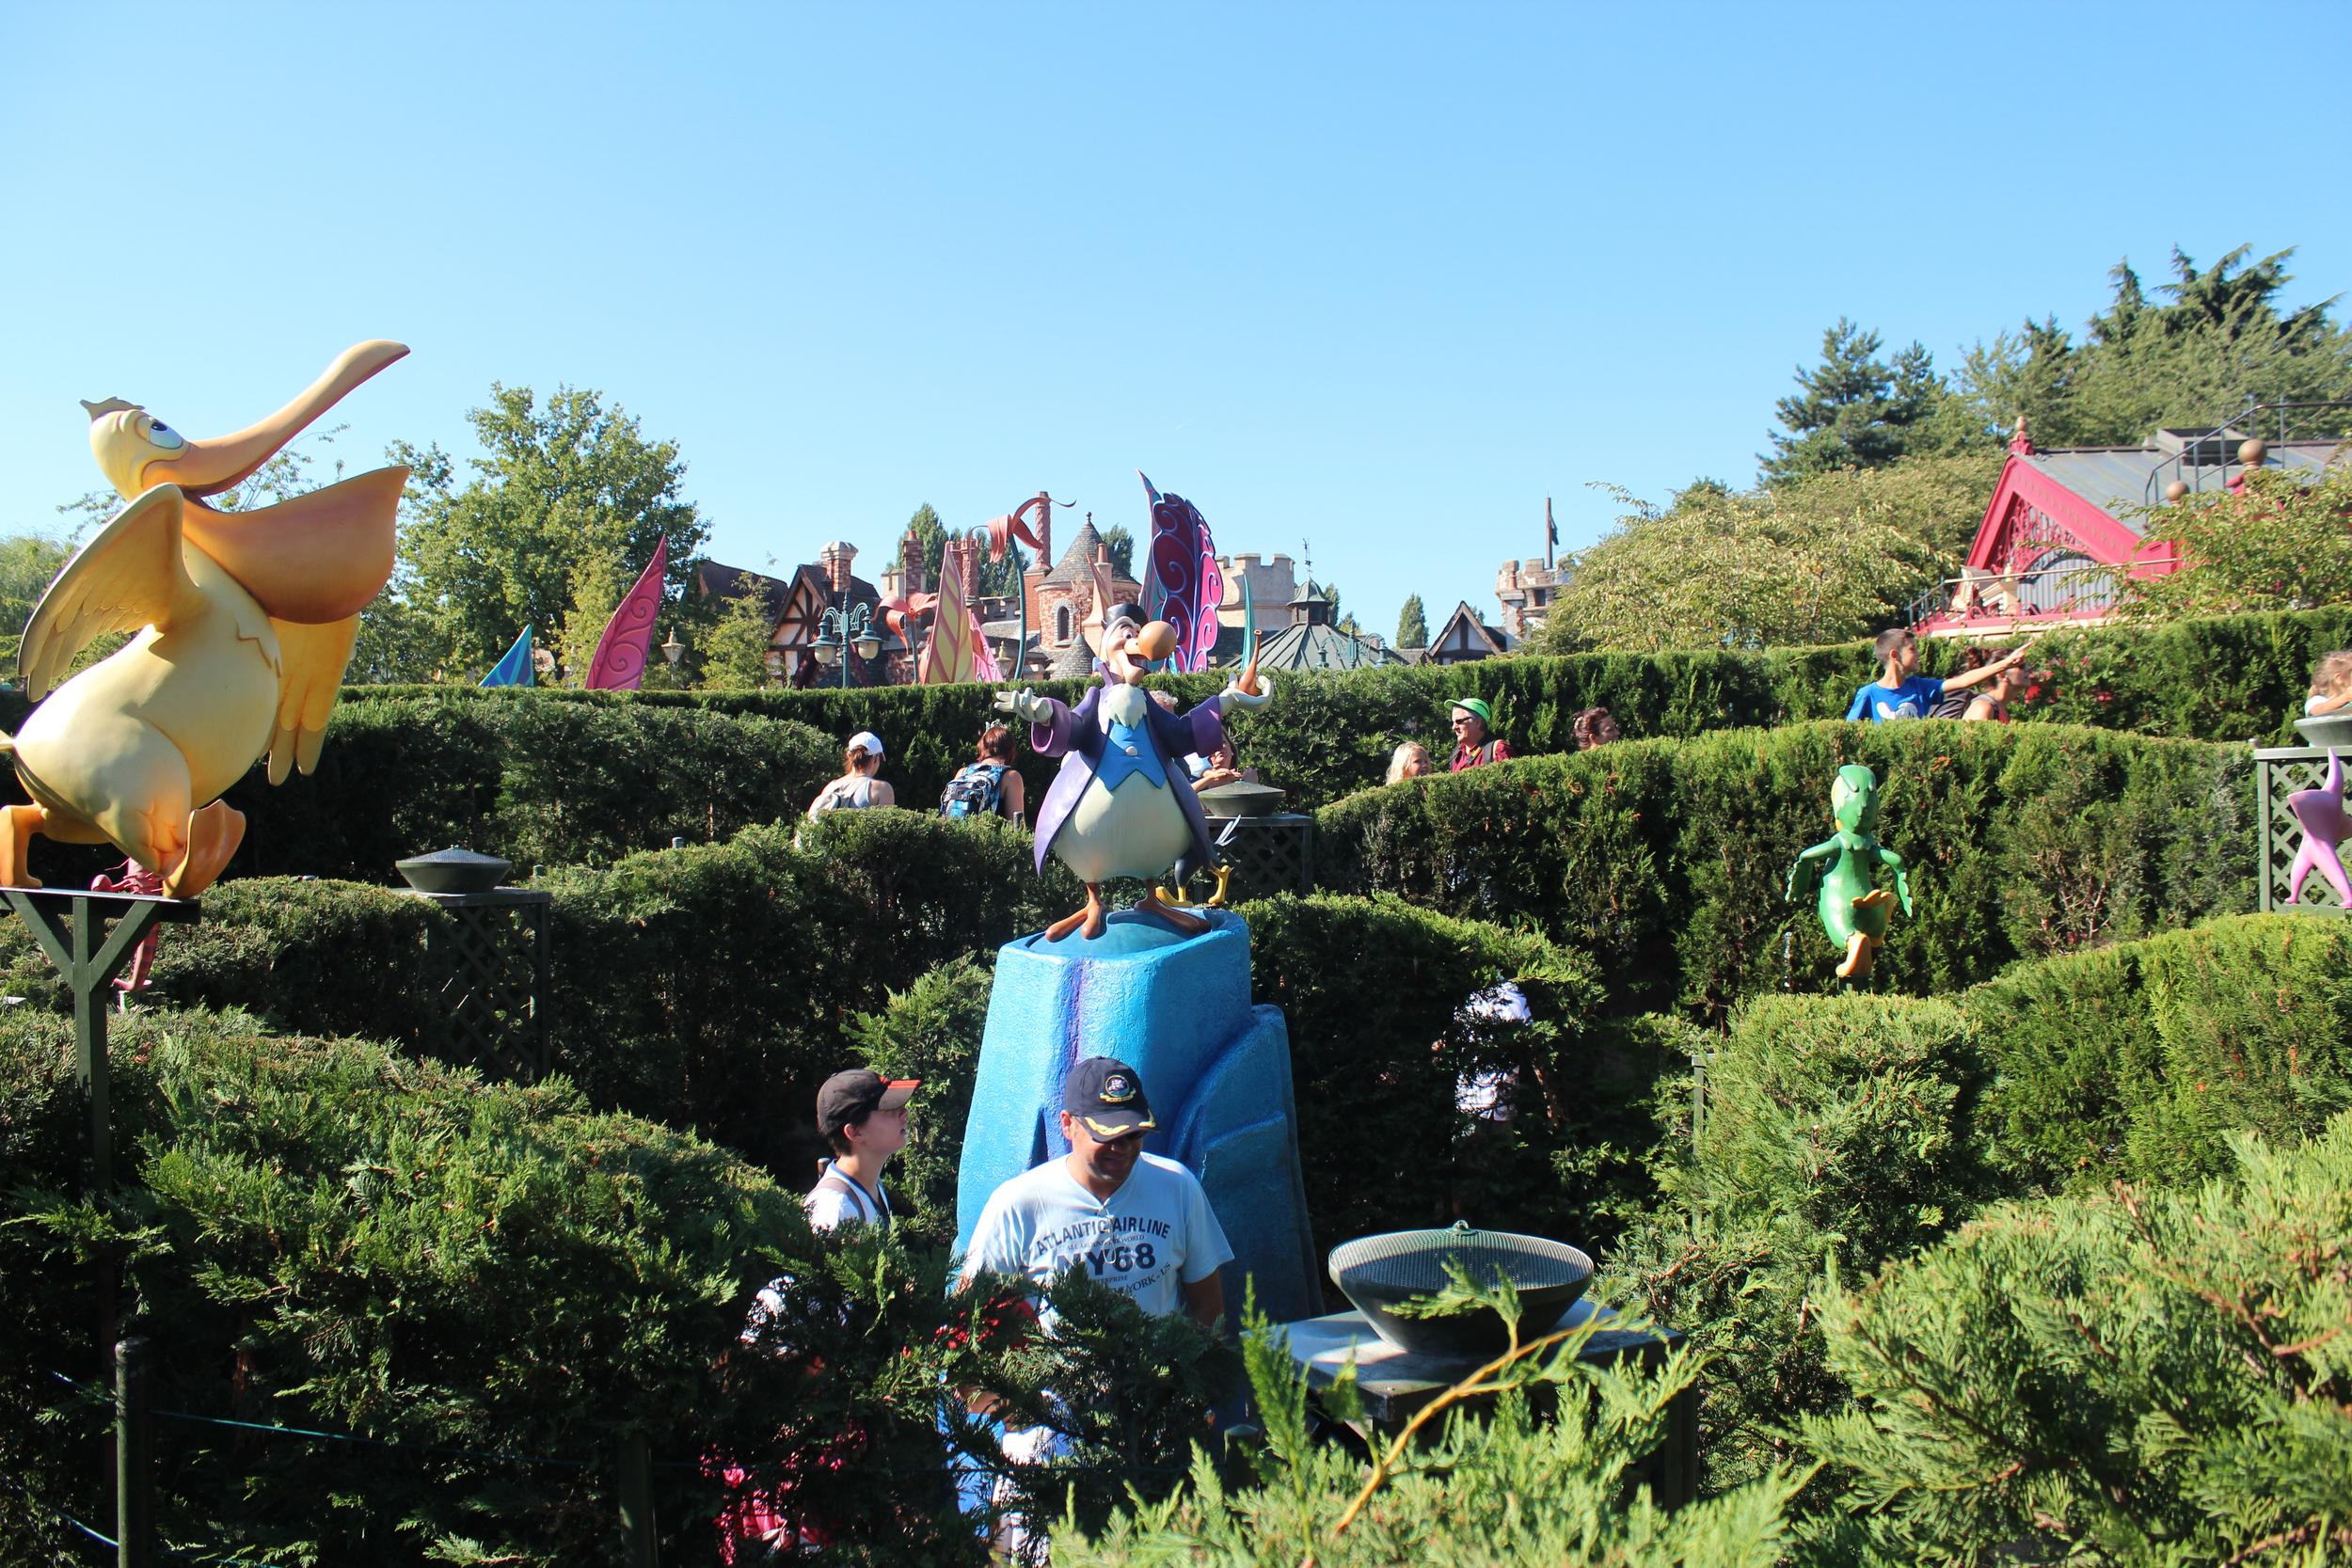 The Labyrinth Disneyland Paris